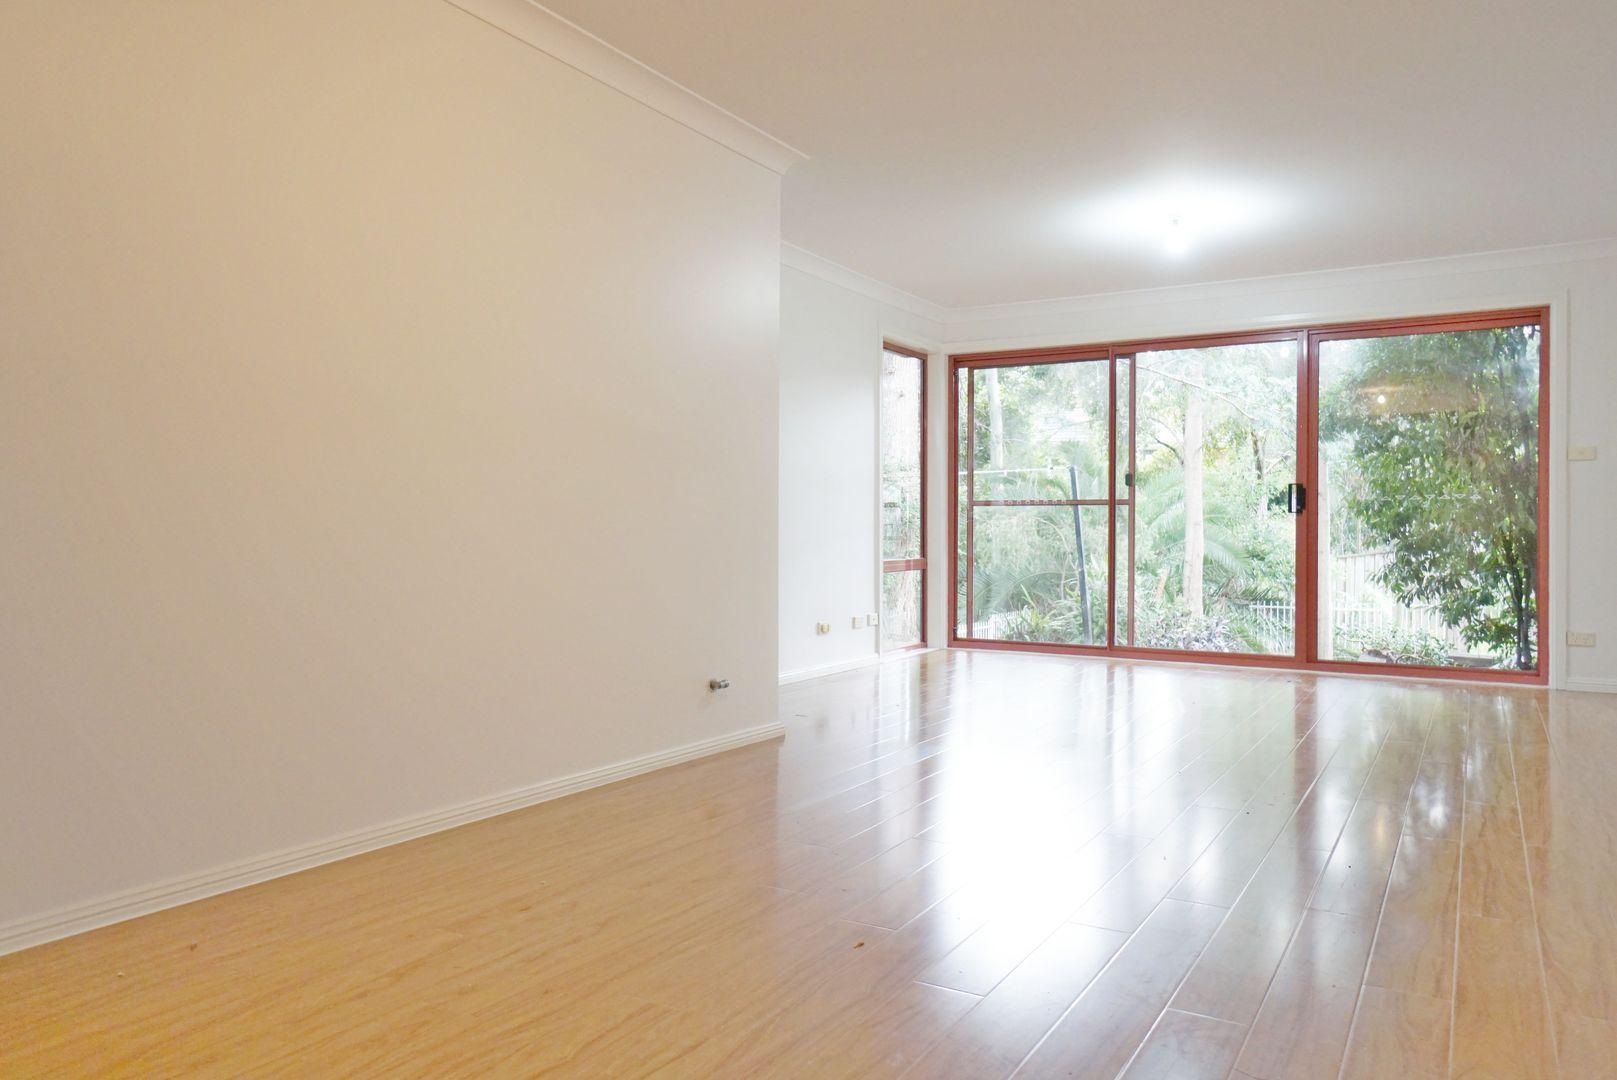 22 Crick  Street, Chatswood NSW 2067, Image 2